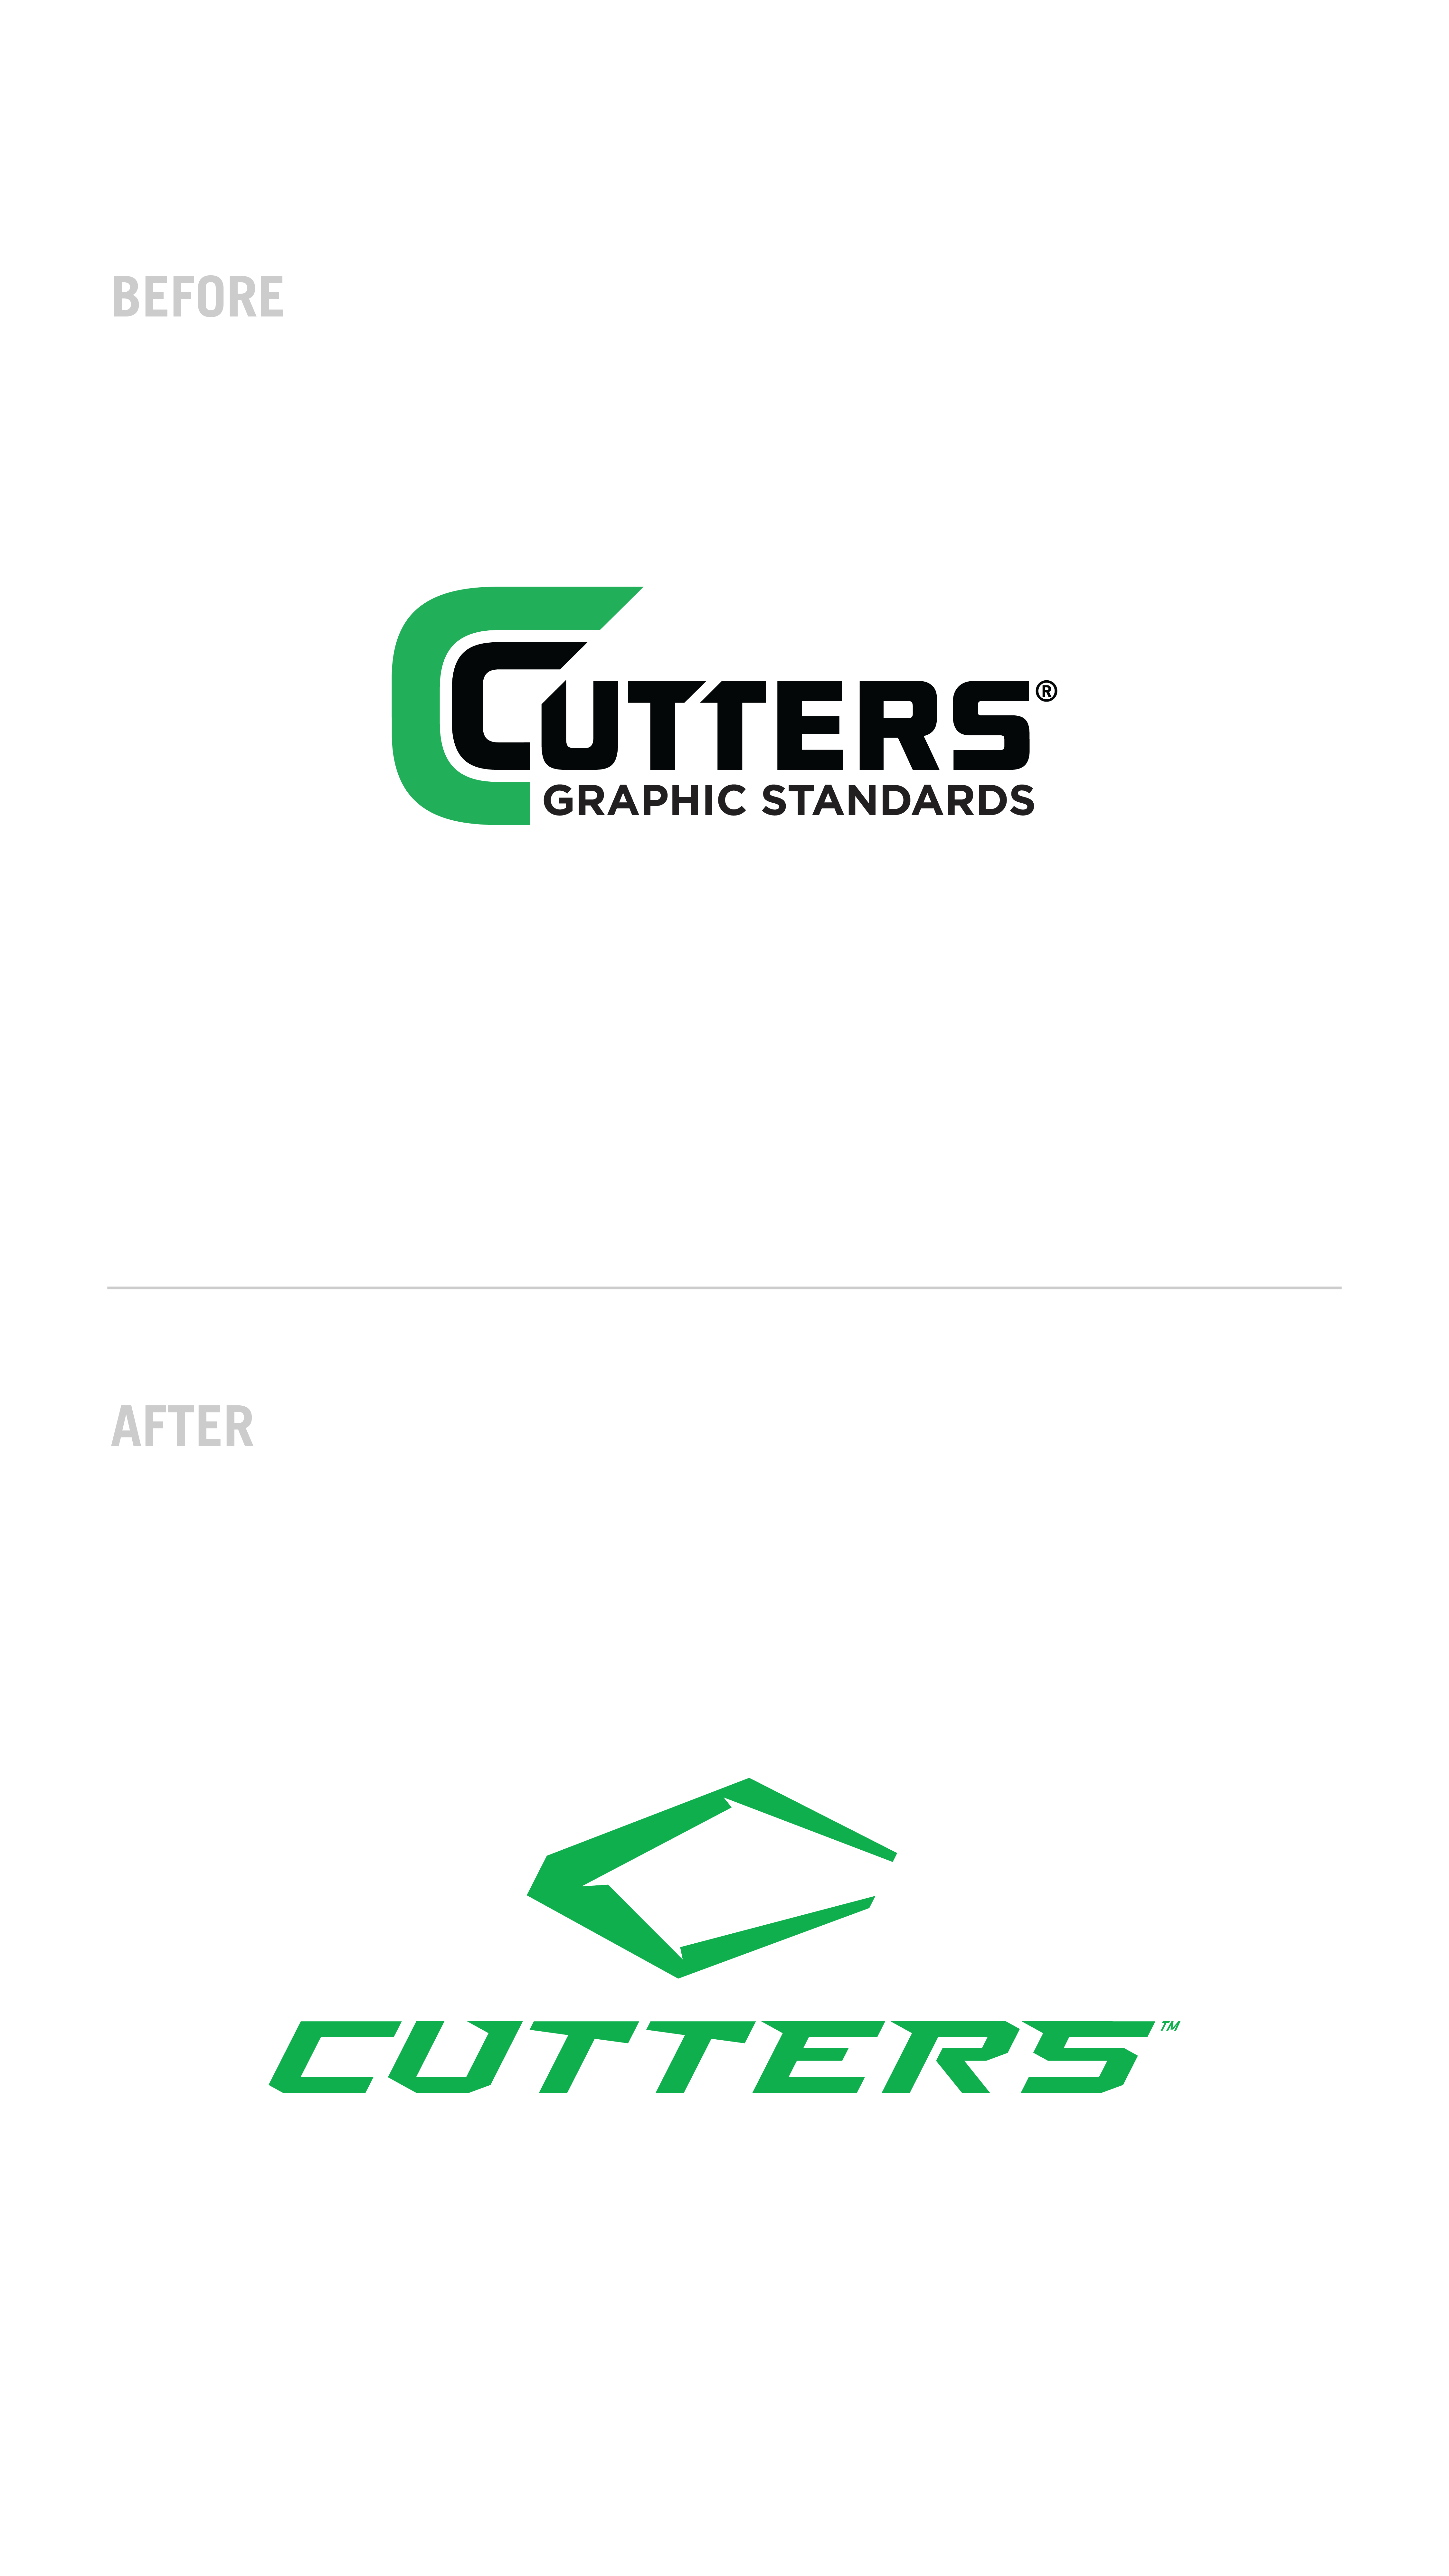 Cutters – Brand Refresh